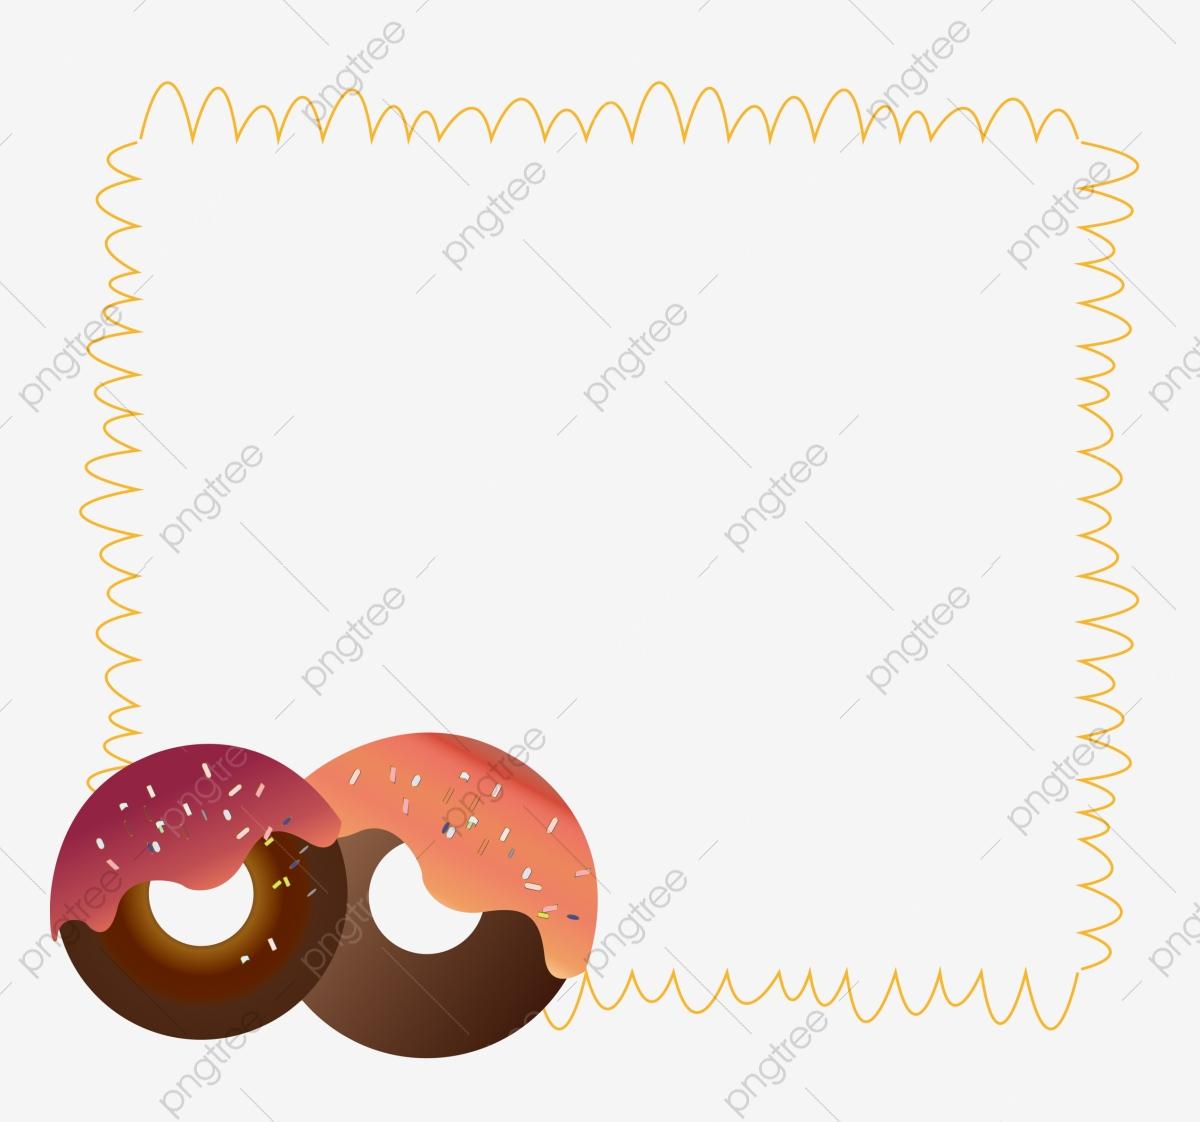 Donut clipart border. Cartoon cookie illustration chocolate